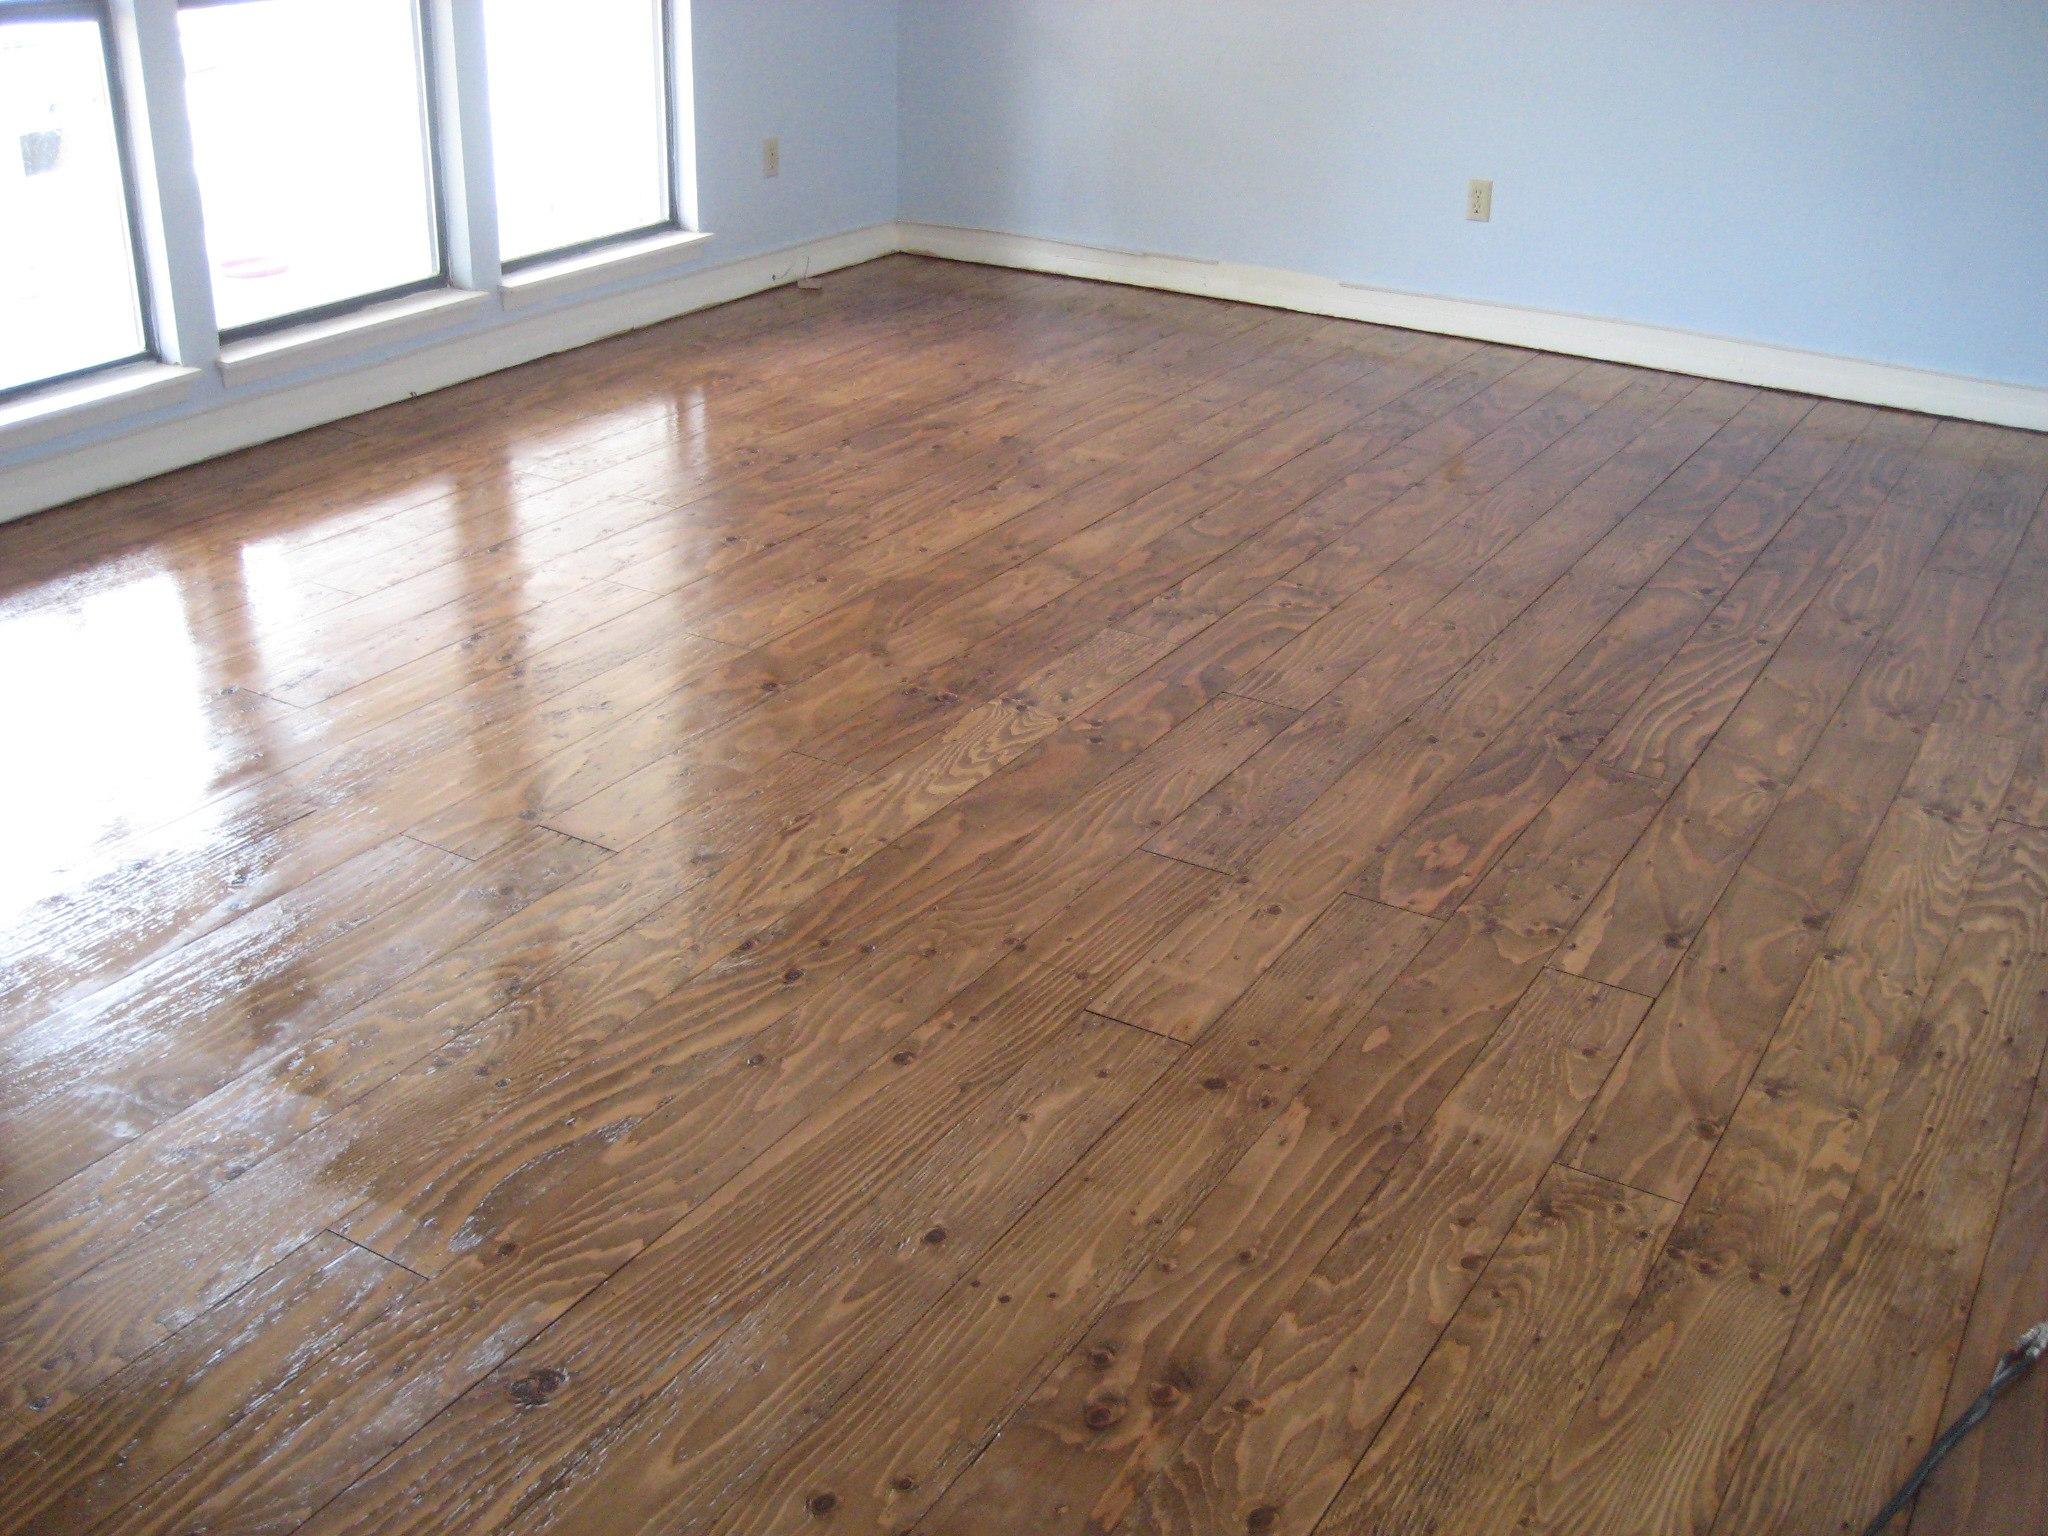 ingenious ideas cheapest hardwood flooring diy cheap shabby goatshabby goat  comments plywood EBUHQUK